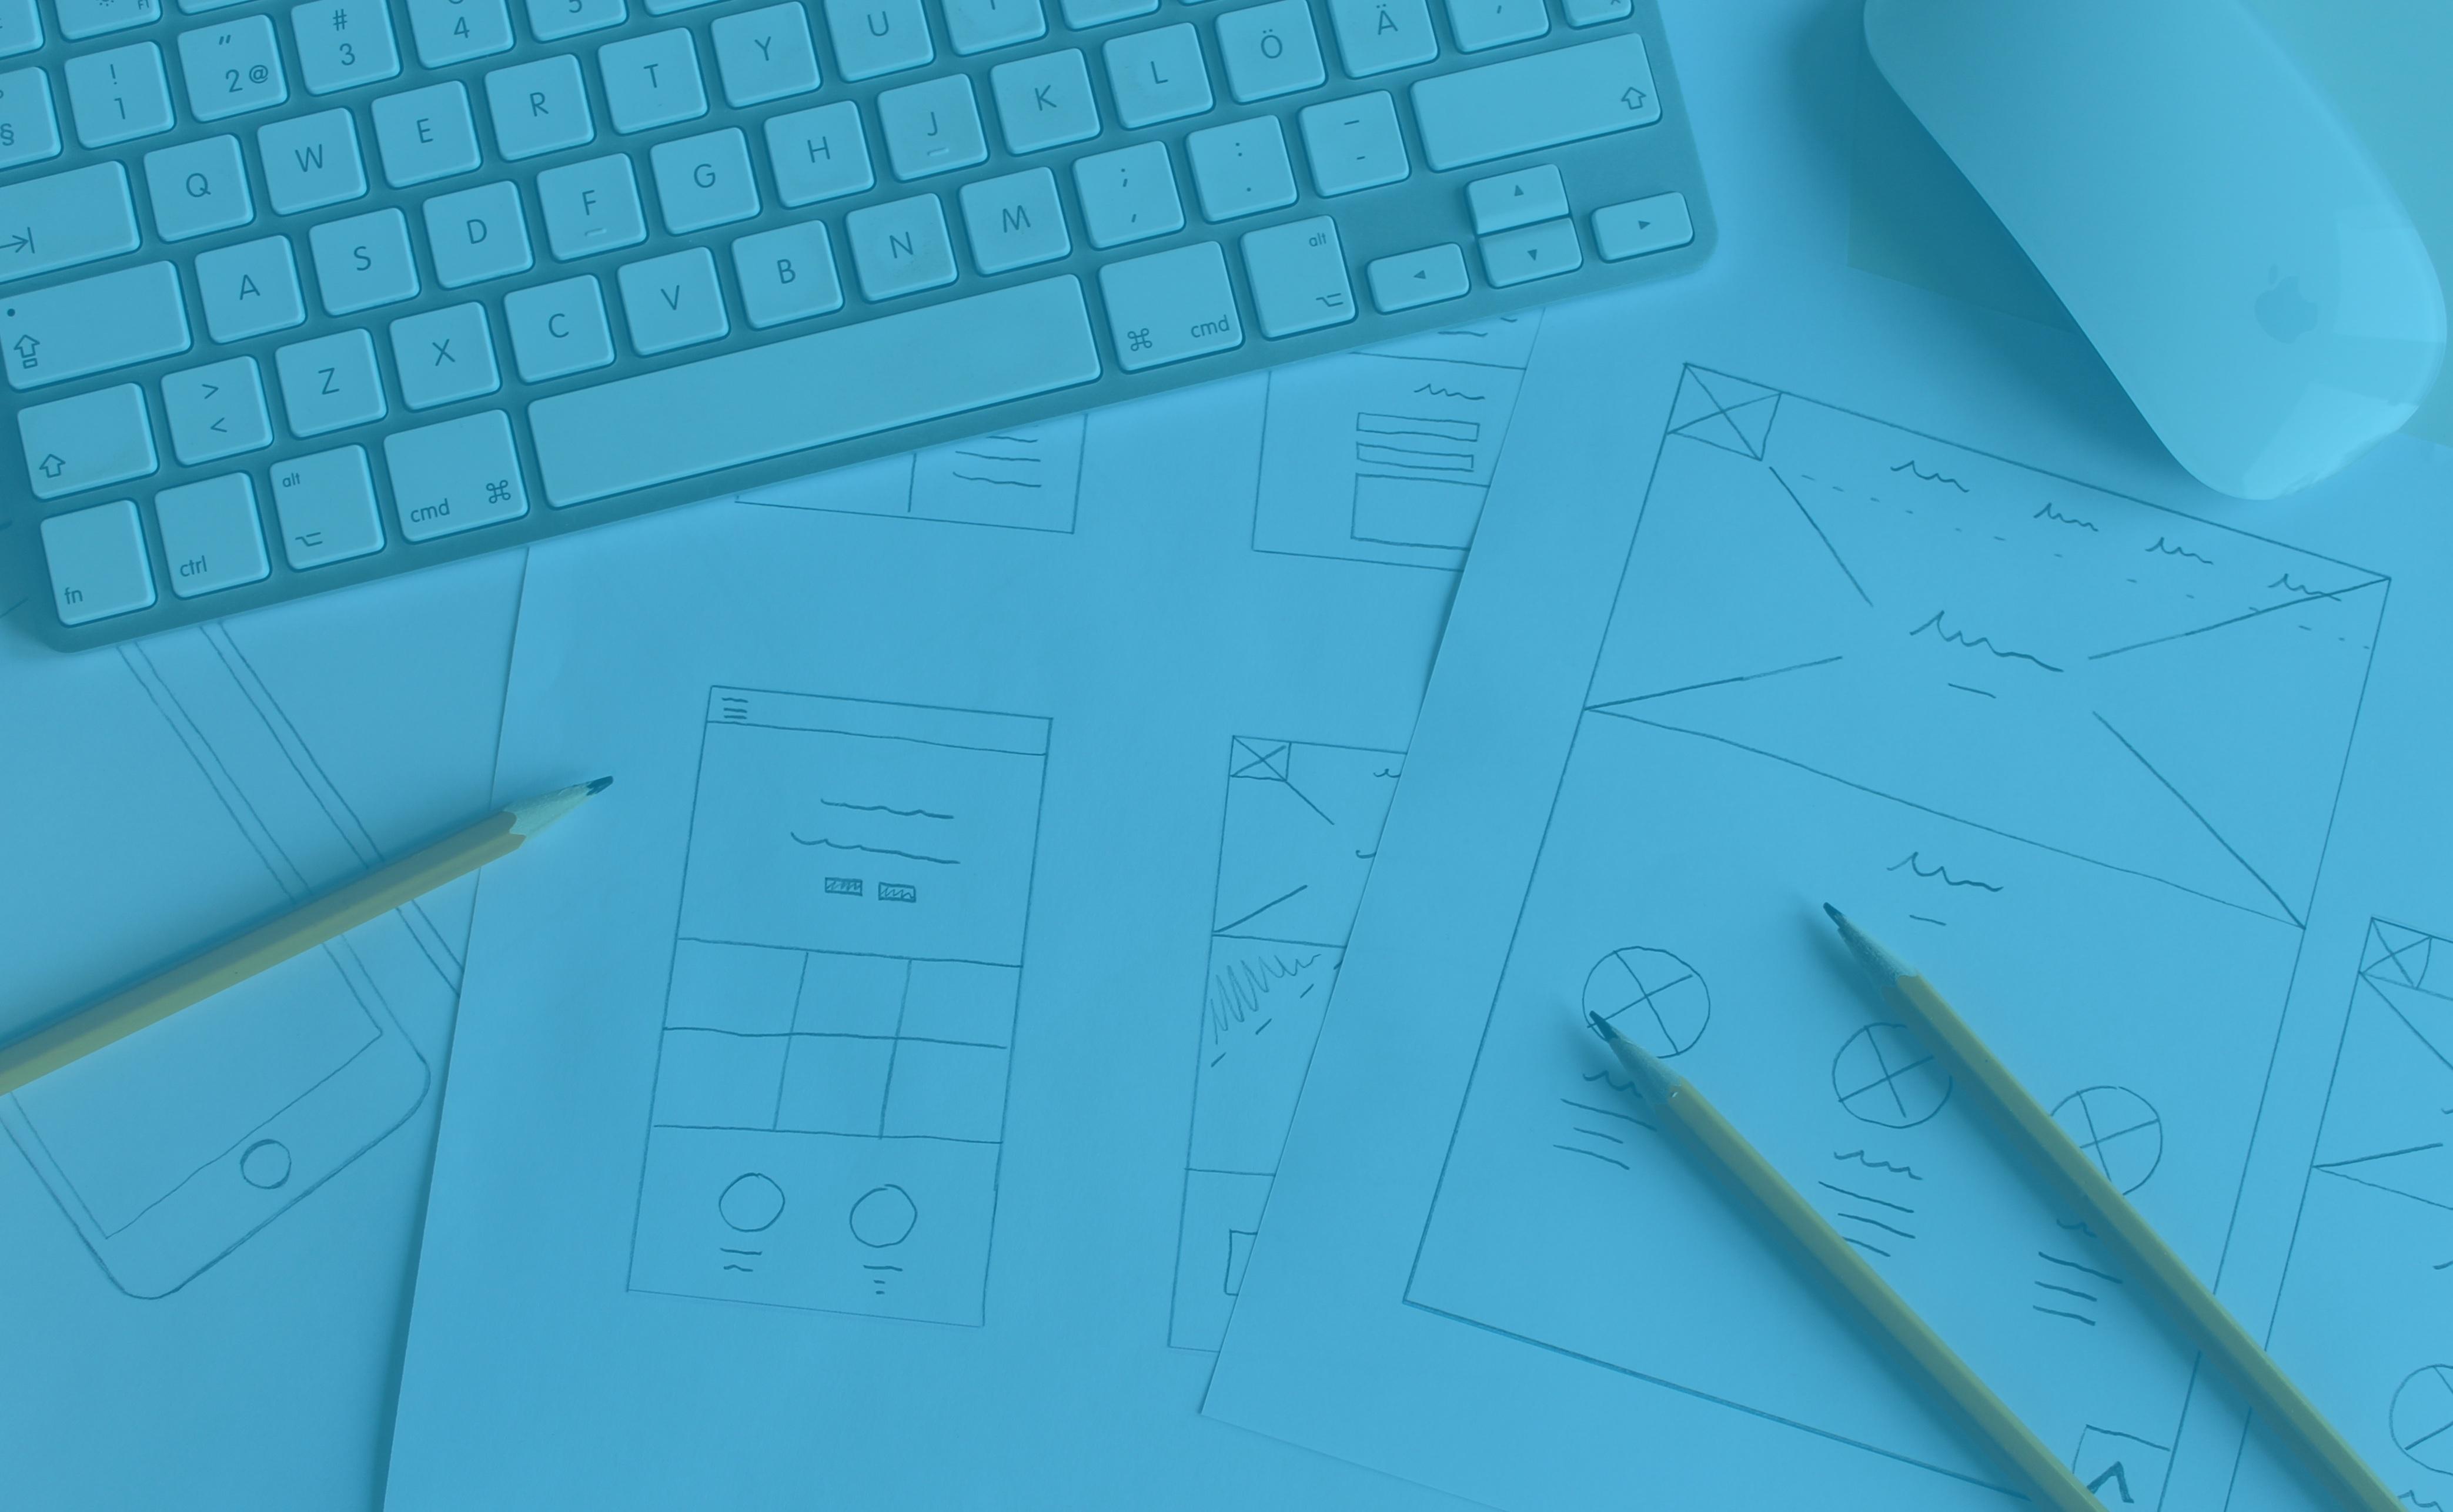 Free Images Mac Apple Wing Pen Line Desktop Font Sketch Diagram Keyboard Graphic Screenshot Computer